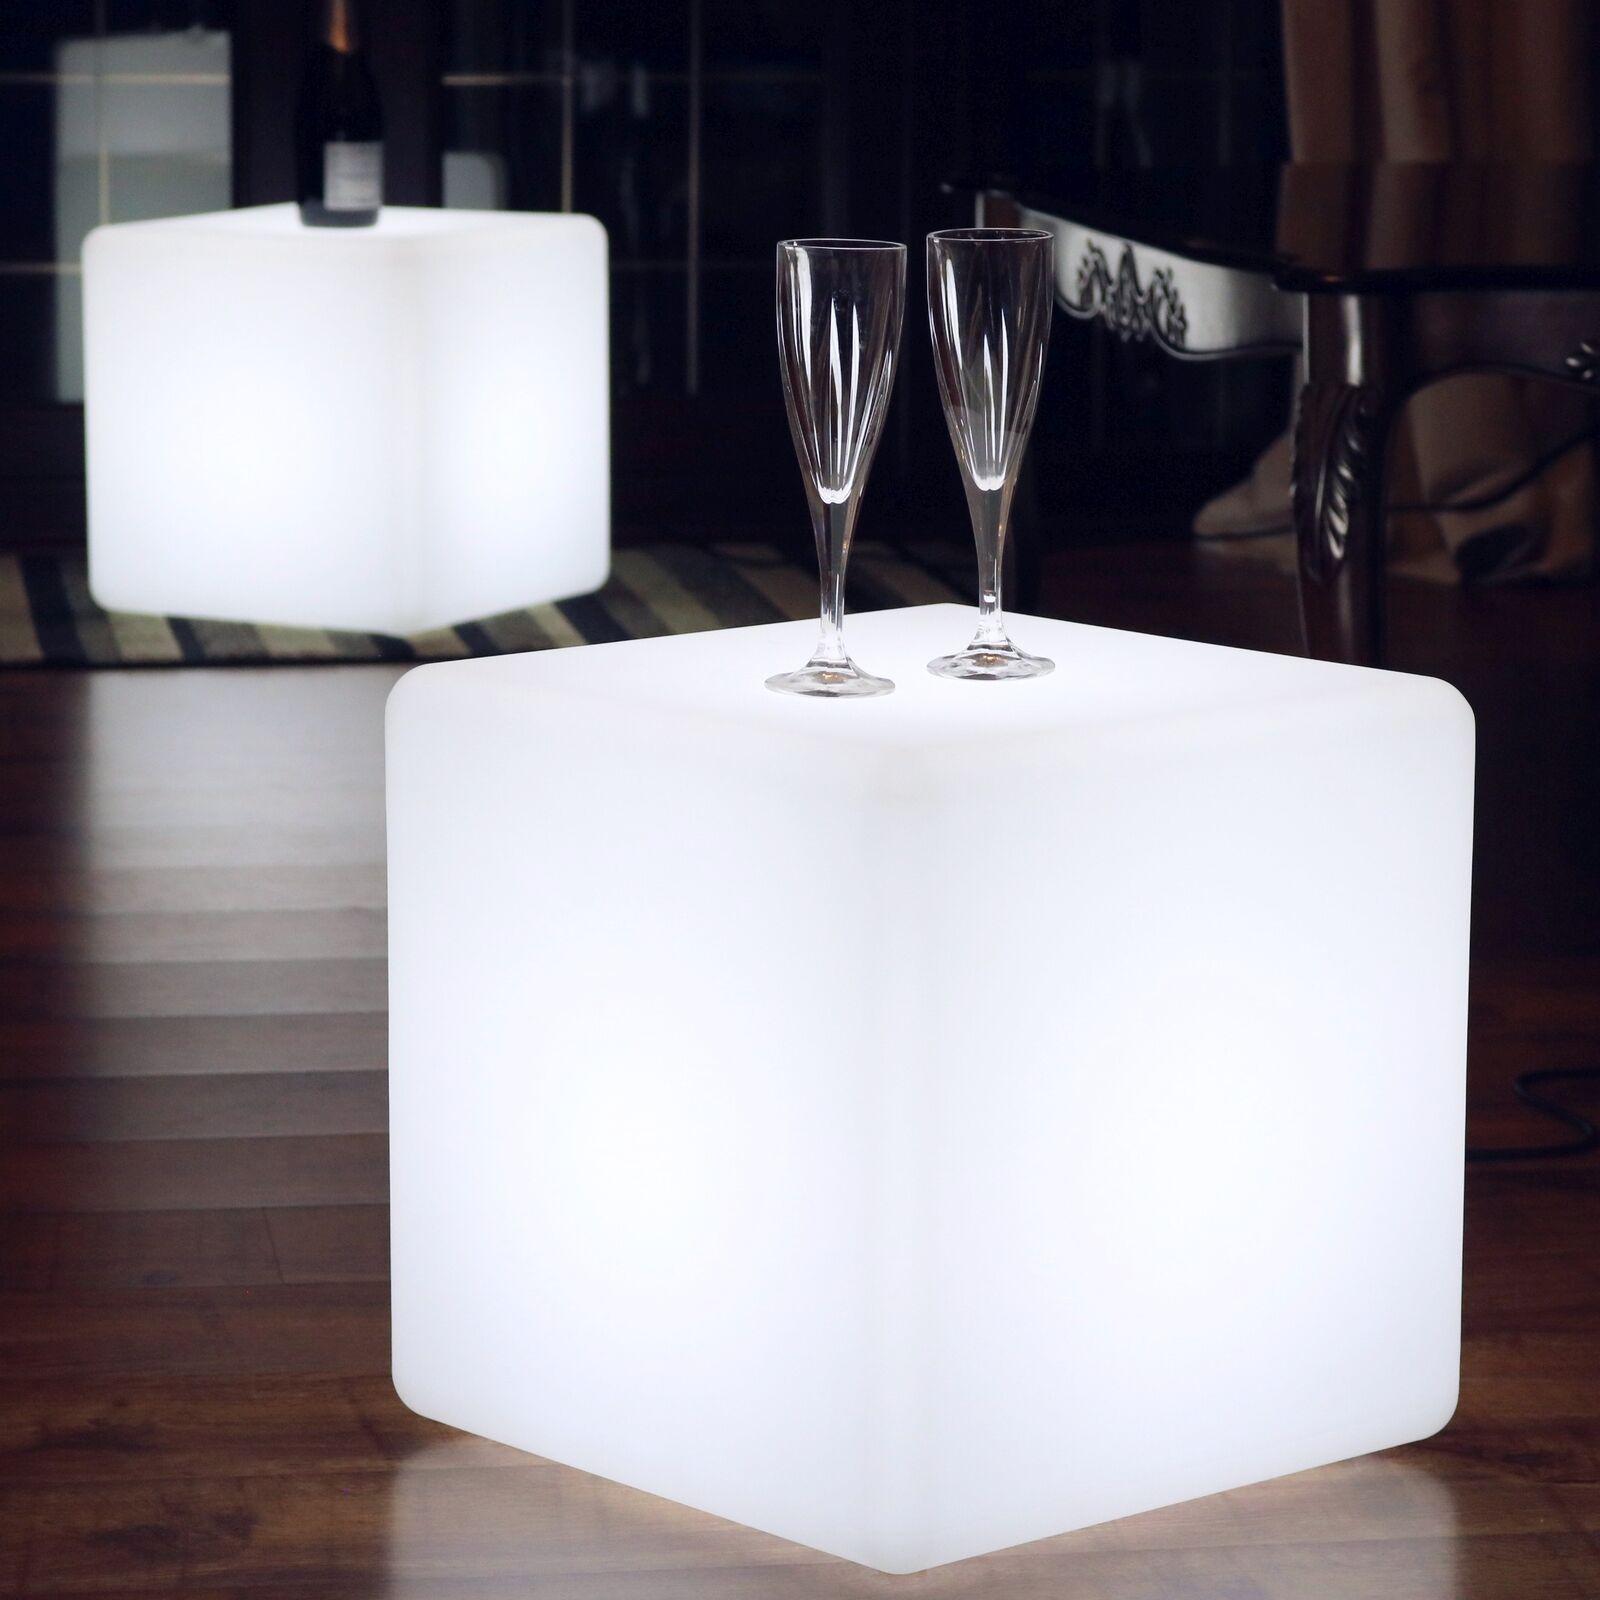 40cm Rete Led Cubo Sgabello Tavolo Pavimento Luce - Bianco da Pk verde